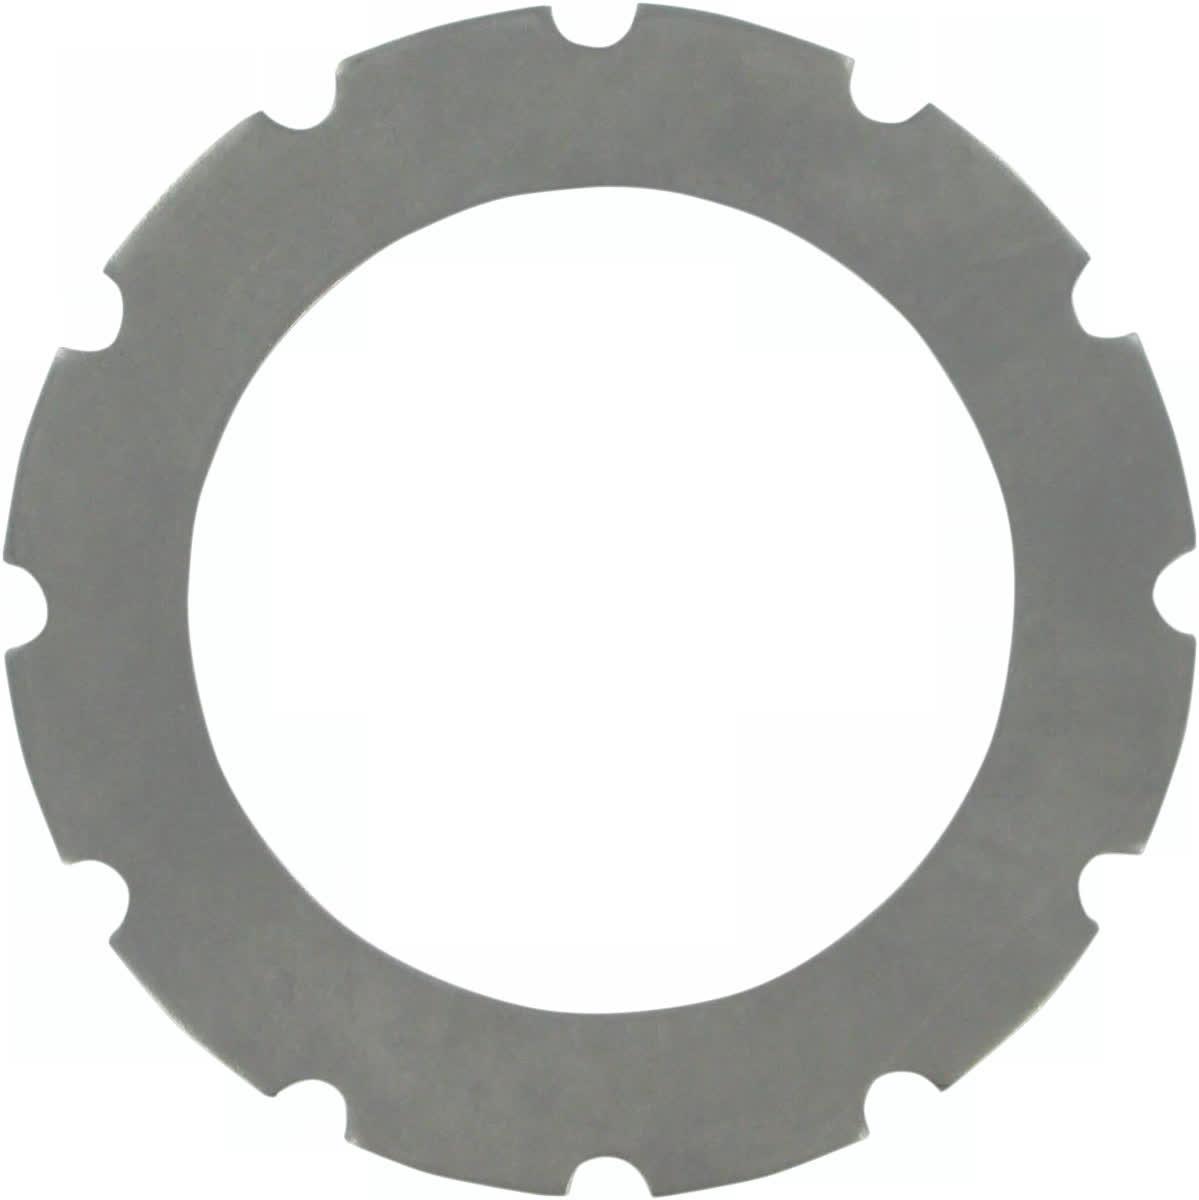 Belt Drives Ltd ERDS-100 Steel Drive Plate Round Dogs